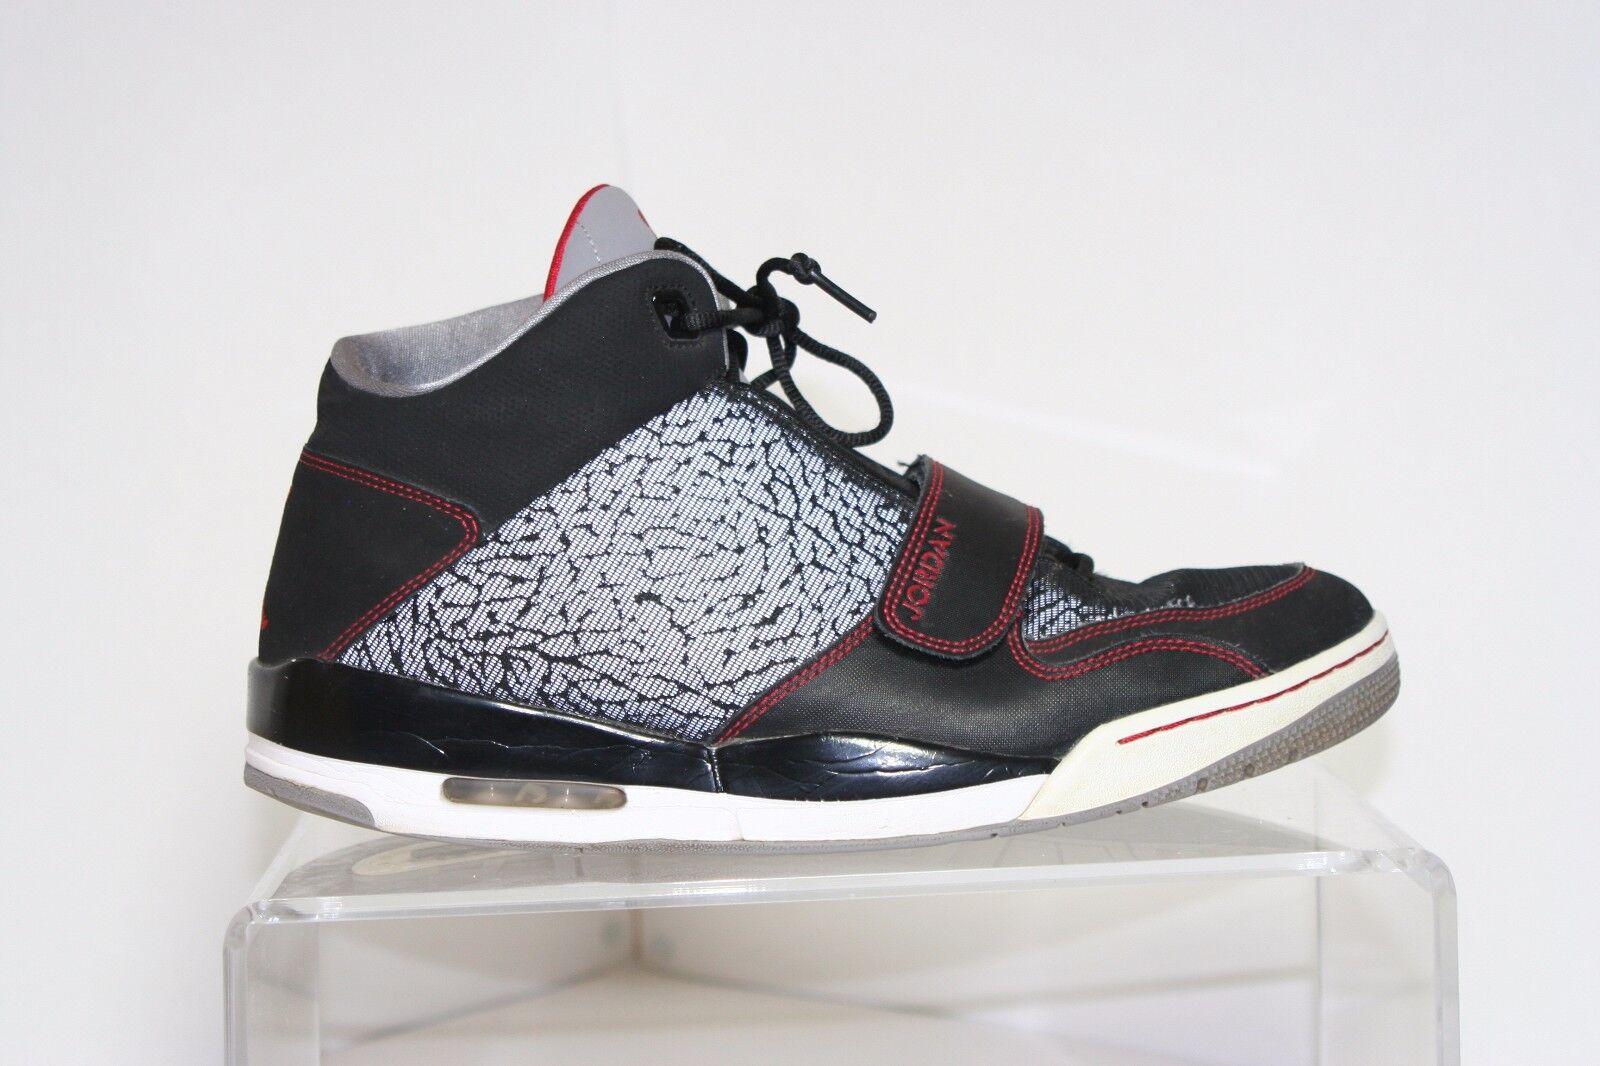 Nike Jordan Flight Club '90 Sneakers Athletic Multi Bred Men's 12 Hipster